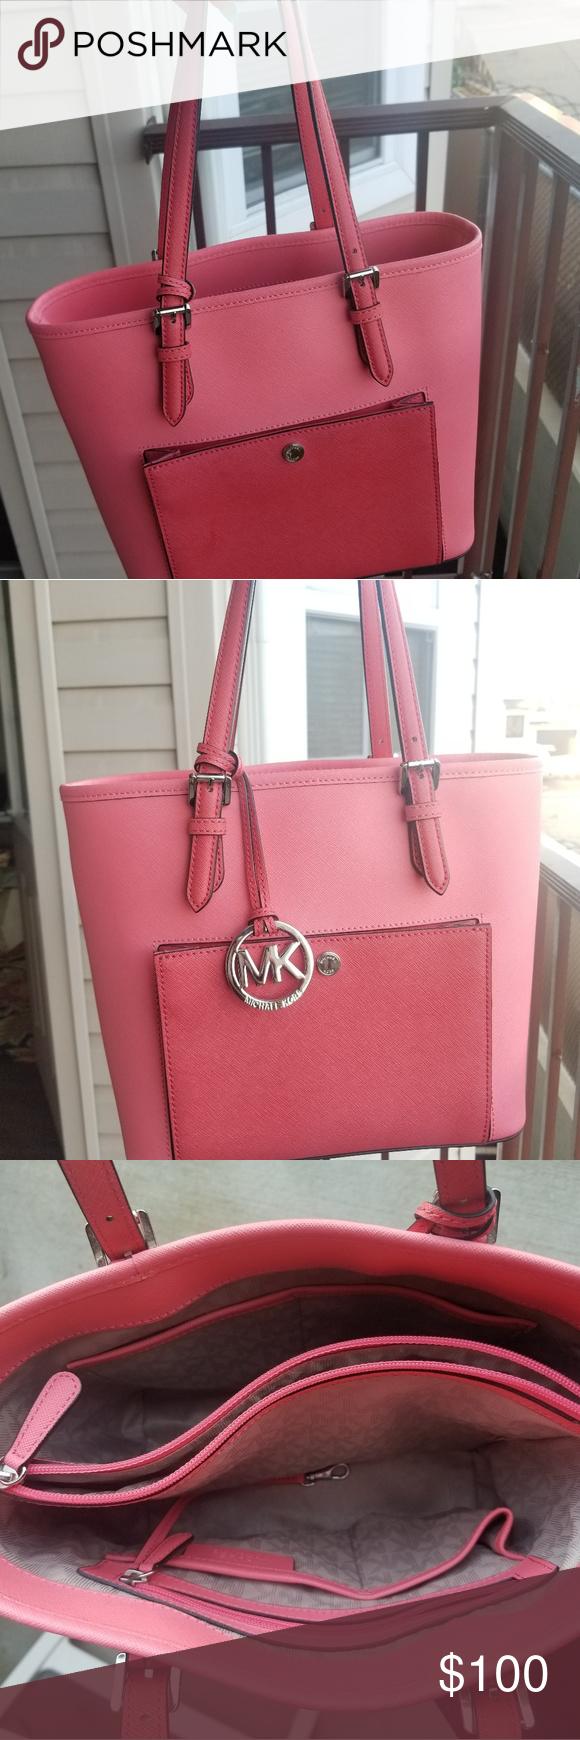 Michael Kors Bag Beautiful coral two toned bag. Front pocket and adjustable stra... -  Michael Kors Bag Beautiful coral two toned bag. Front pocket and adjustable straps   Excellent cond - #adjustable #AlexaChung #AngelaSimmons #Bag #Beautiful #CannesFilmFestival #CelebritiesFashion #CelebrityStyle #coral #CurvyPetiteFashion #DianeKruger #EmmaRoberts #FashionDesigners #FashionTrends #Front #KendallJennerOutfits #KimKardashian #Kors #LouisVuitton #LouisVuittonHandbags #LouisVuittonMonogram #LvHa